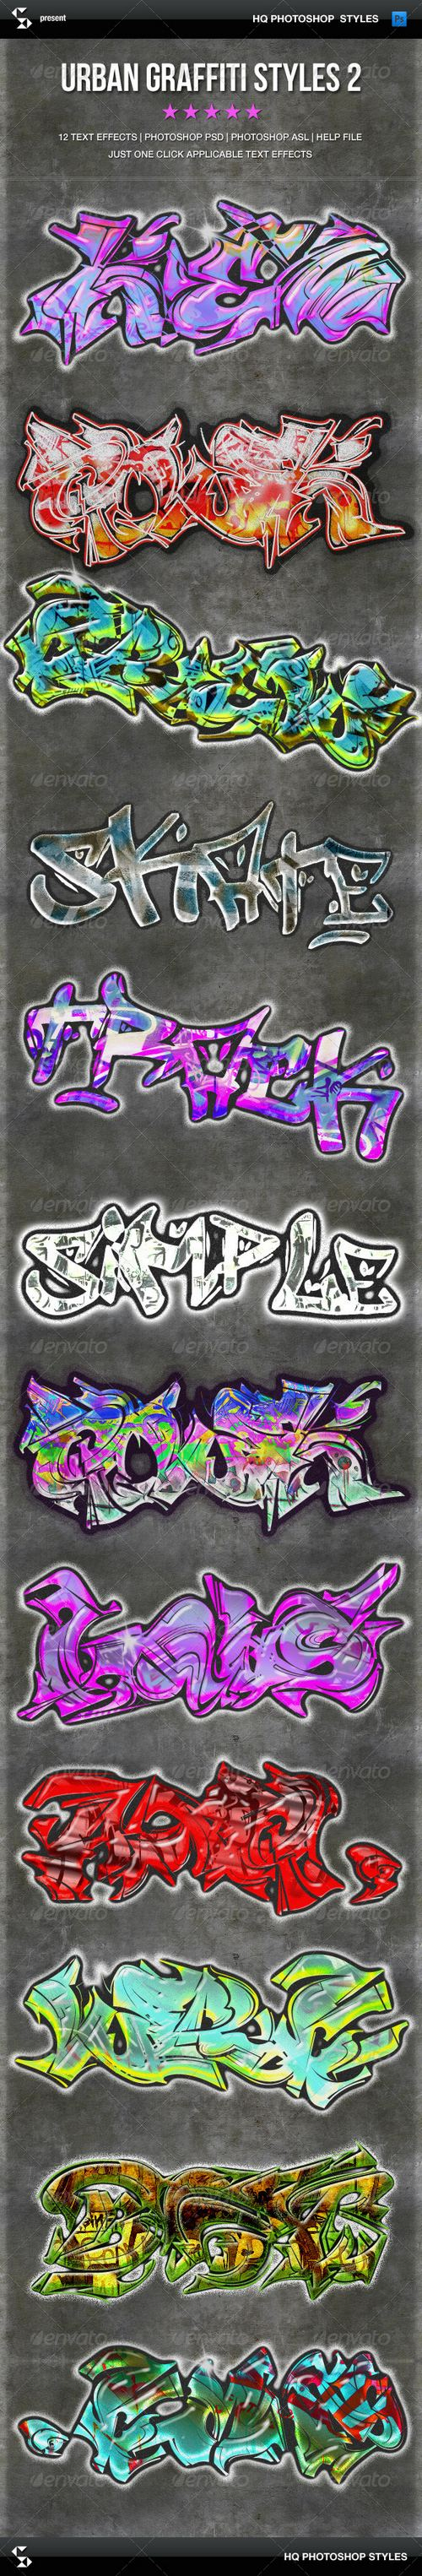 граффити текст для фотошопа автопутешествиях, маршруты